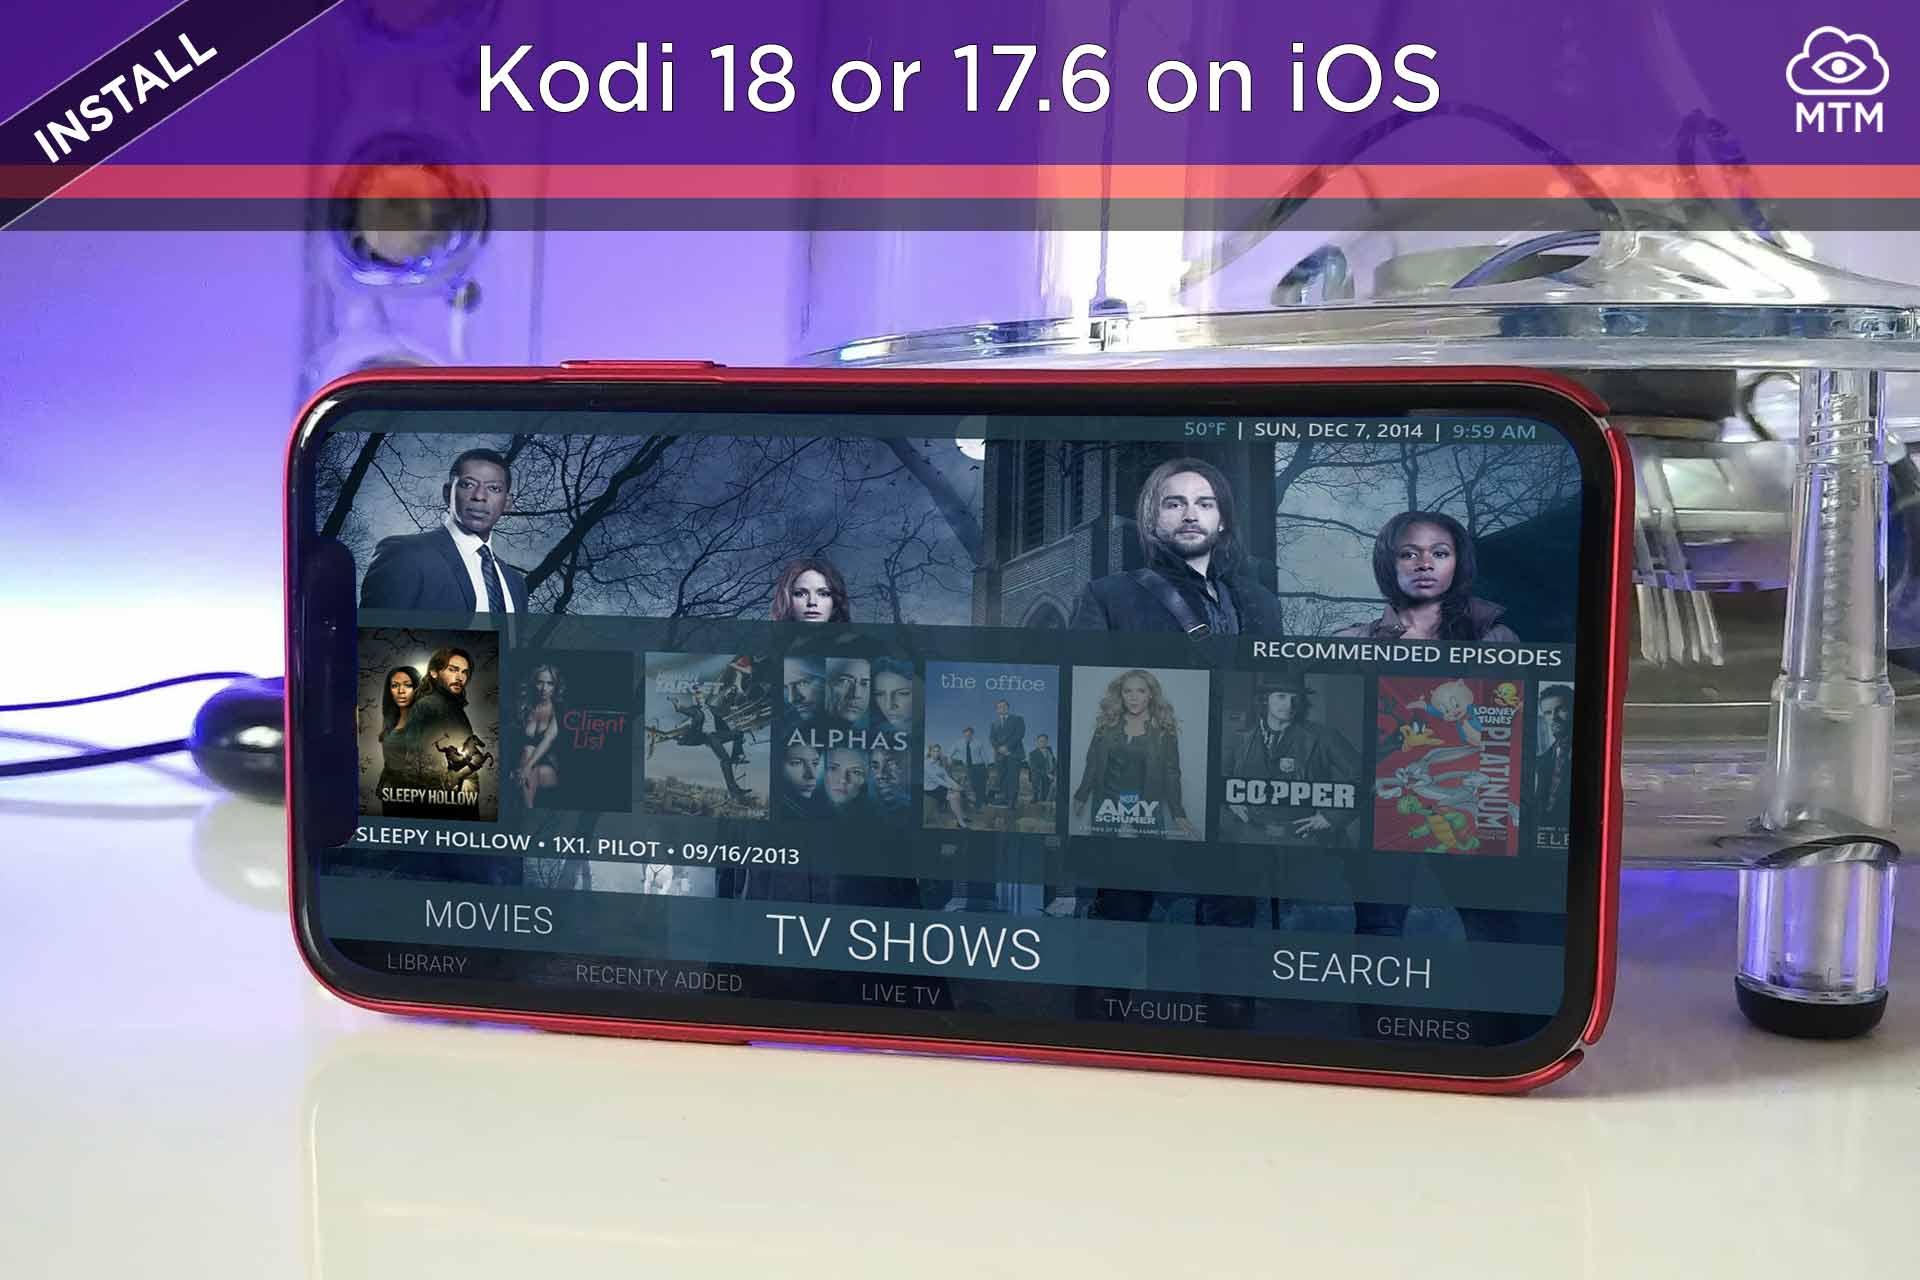 Download Kodi 18 on iPhone, iPad, or iPod [No Jailbreak